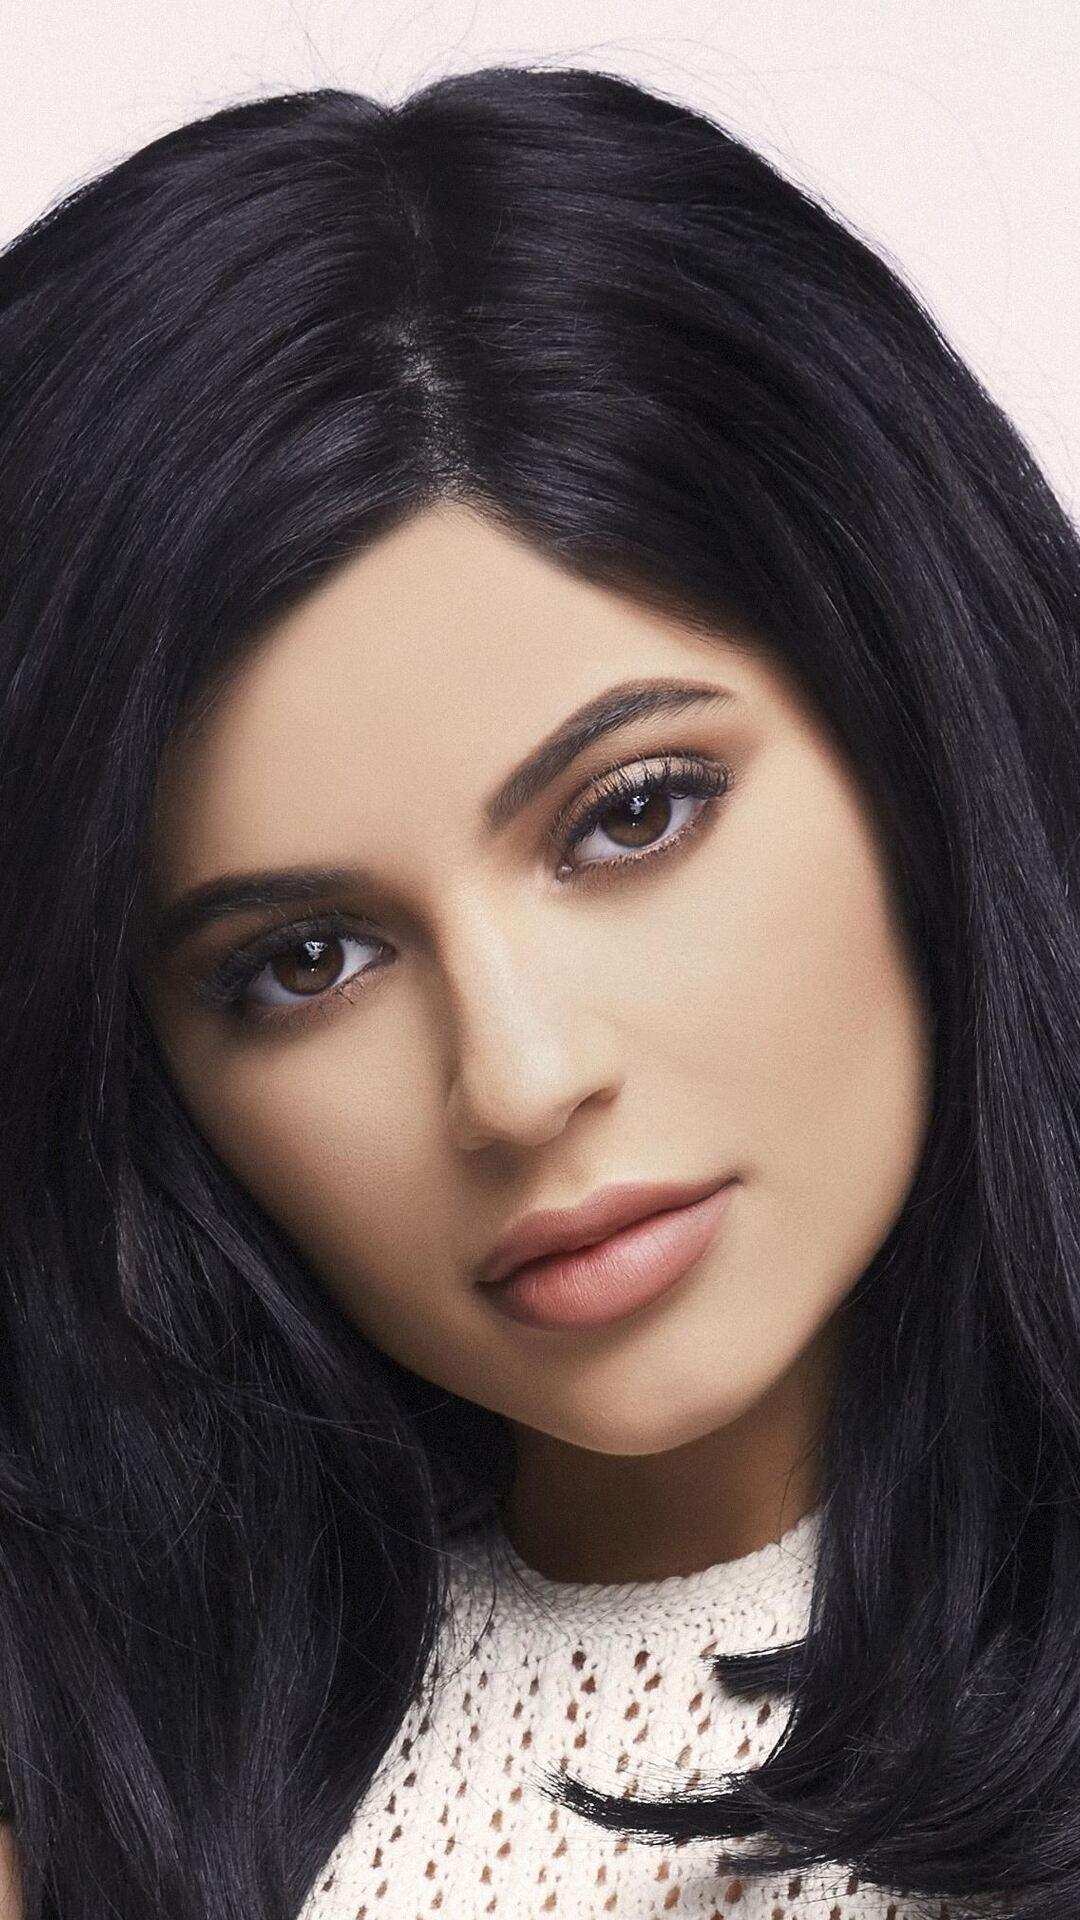 1080x1920 2016 Kylie Jenner Iphone 7,6s,6 Plus, Pixel xl ...